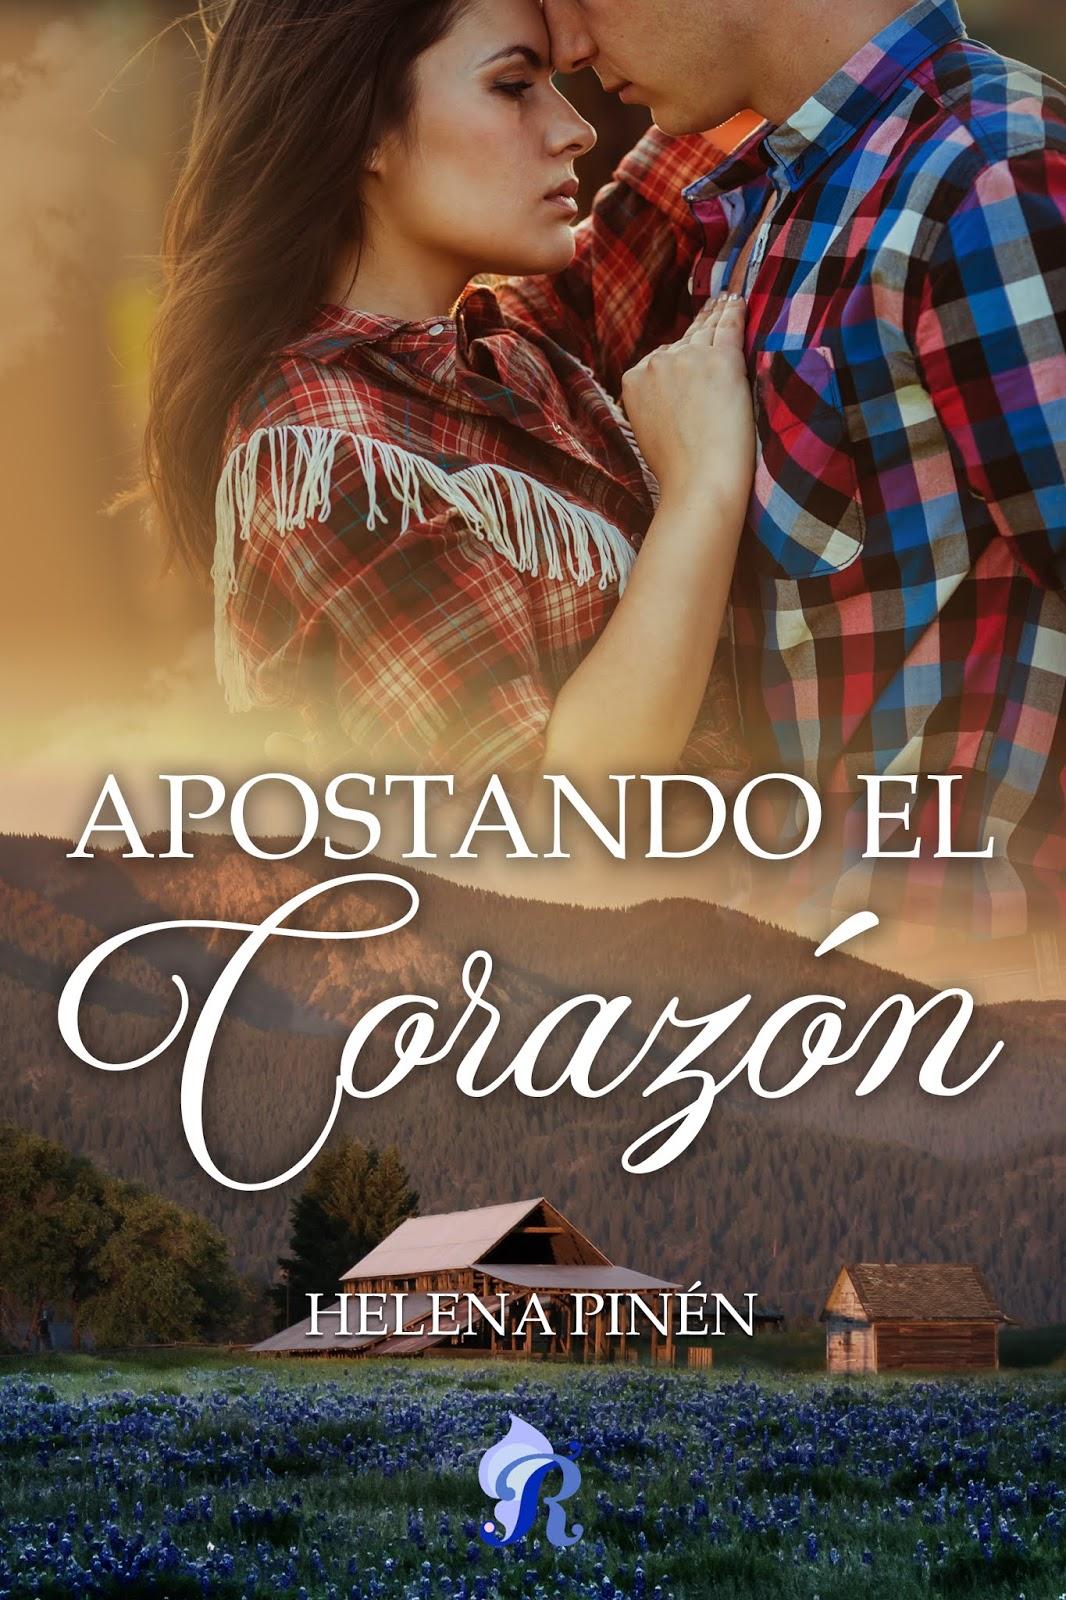 Apostando el corazón de Helena Pinén